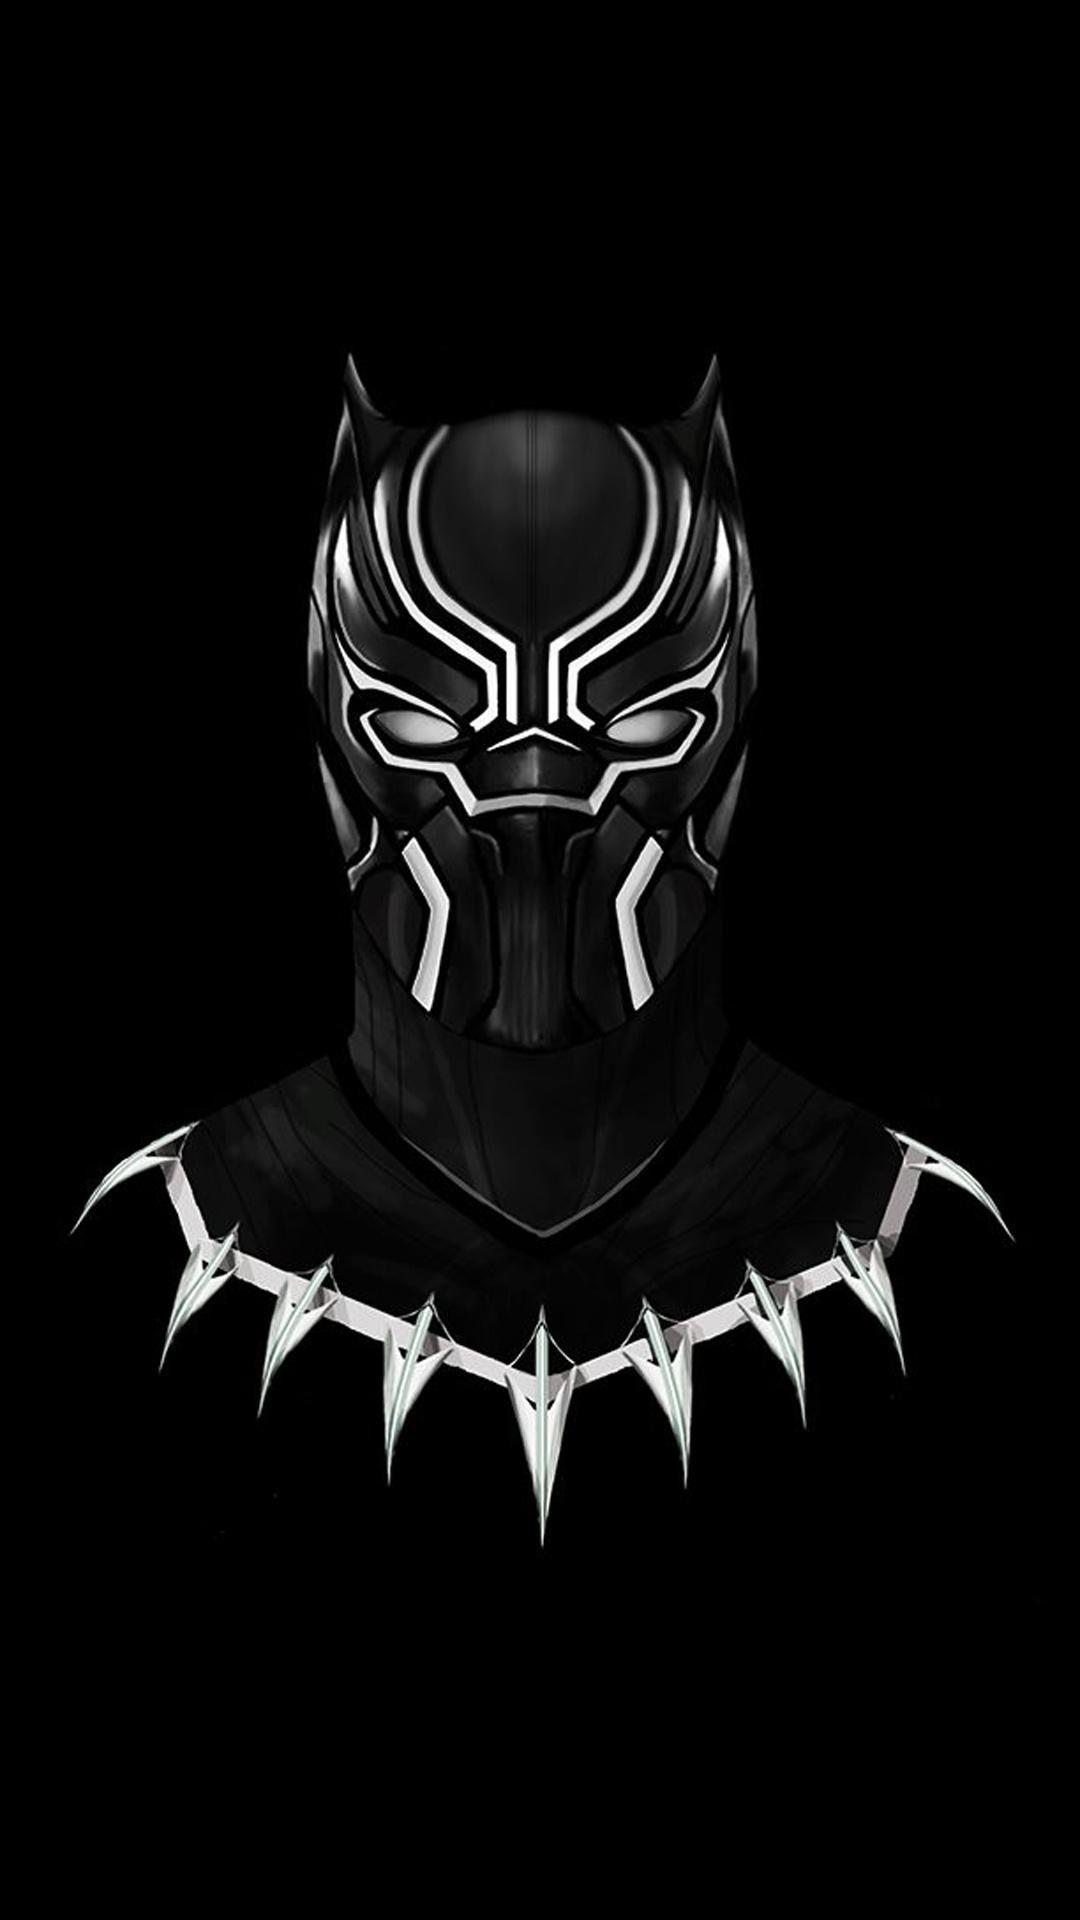 Film Review Black Panther Strange Harbors Black Panther Marvel Black Panther Hd Wallpaper Black Panther Art